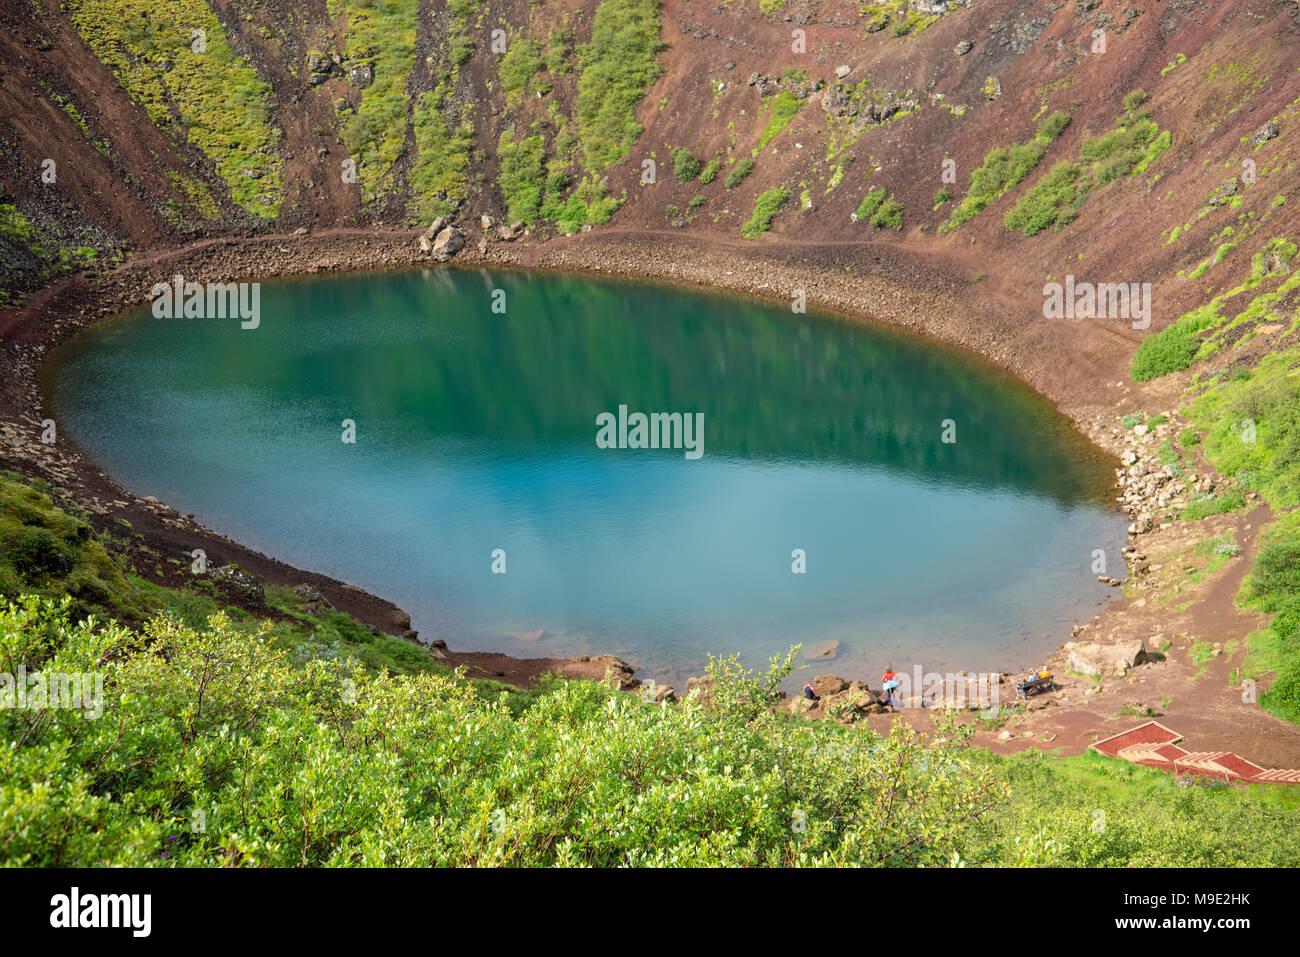 Bogenle Kupfer circular pond aerial stockfotos circular pond aerial bilder alamy